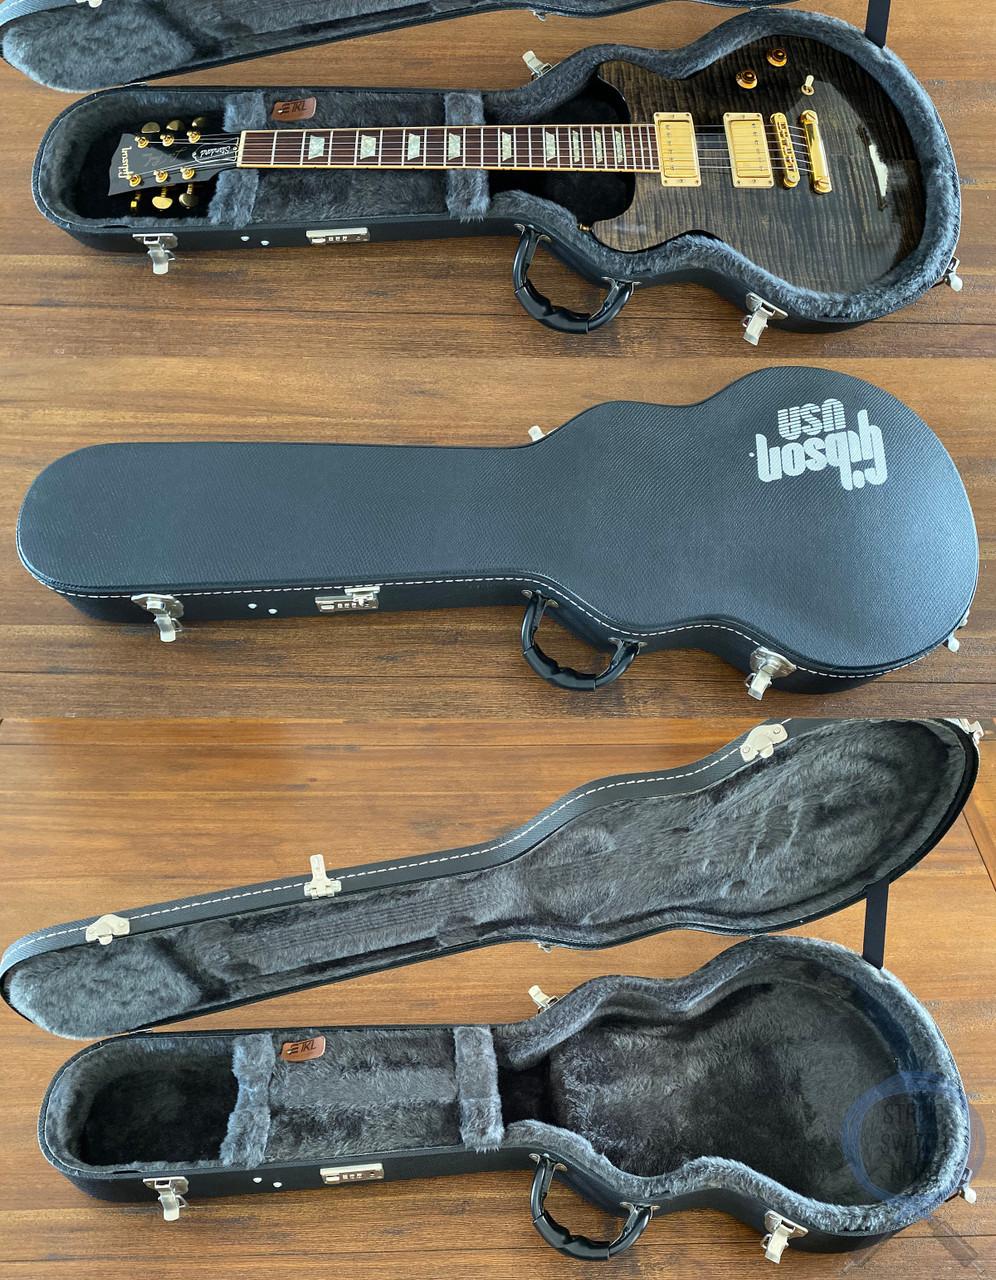 Gibson Les Paul, Standard, Double Cut, Tran Black, USA, 2002, OHSC